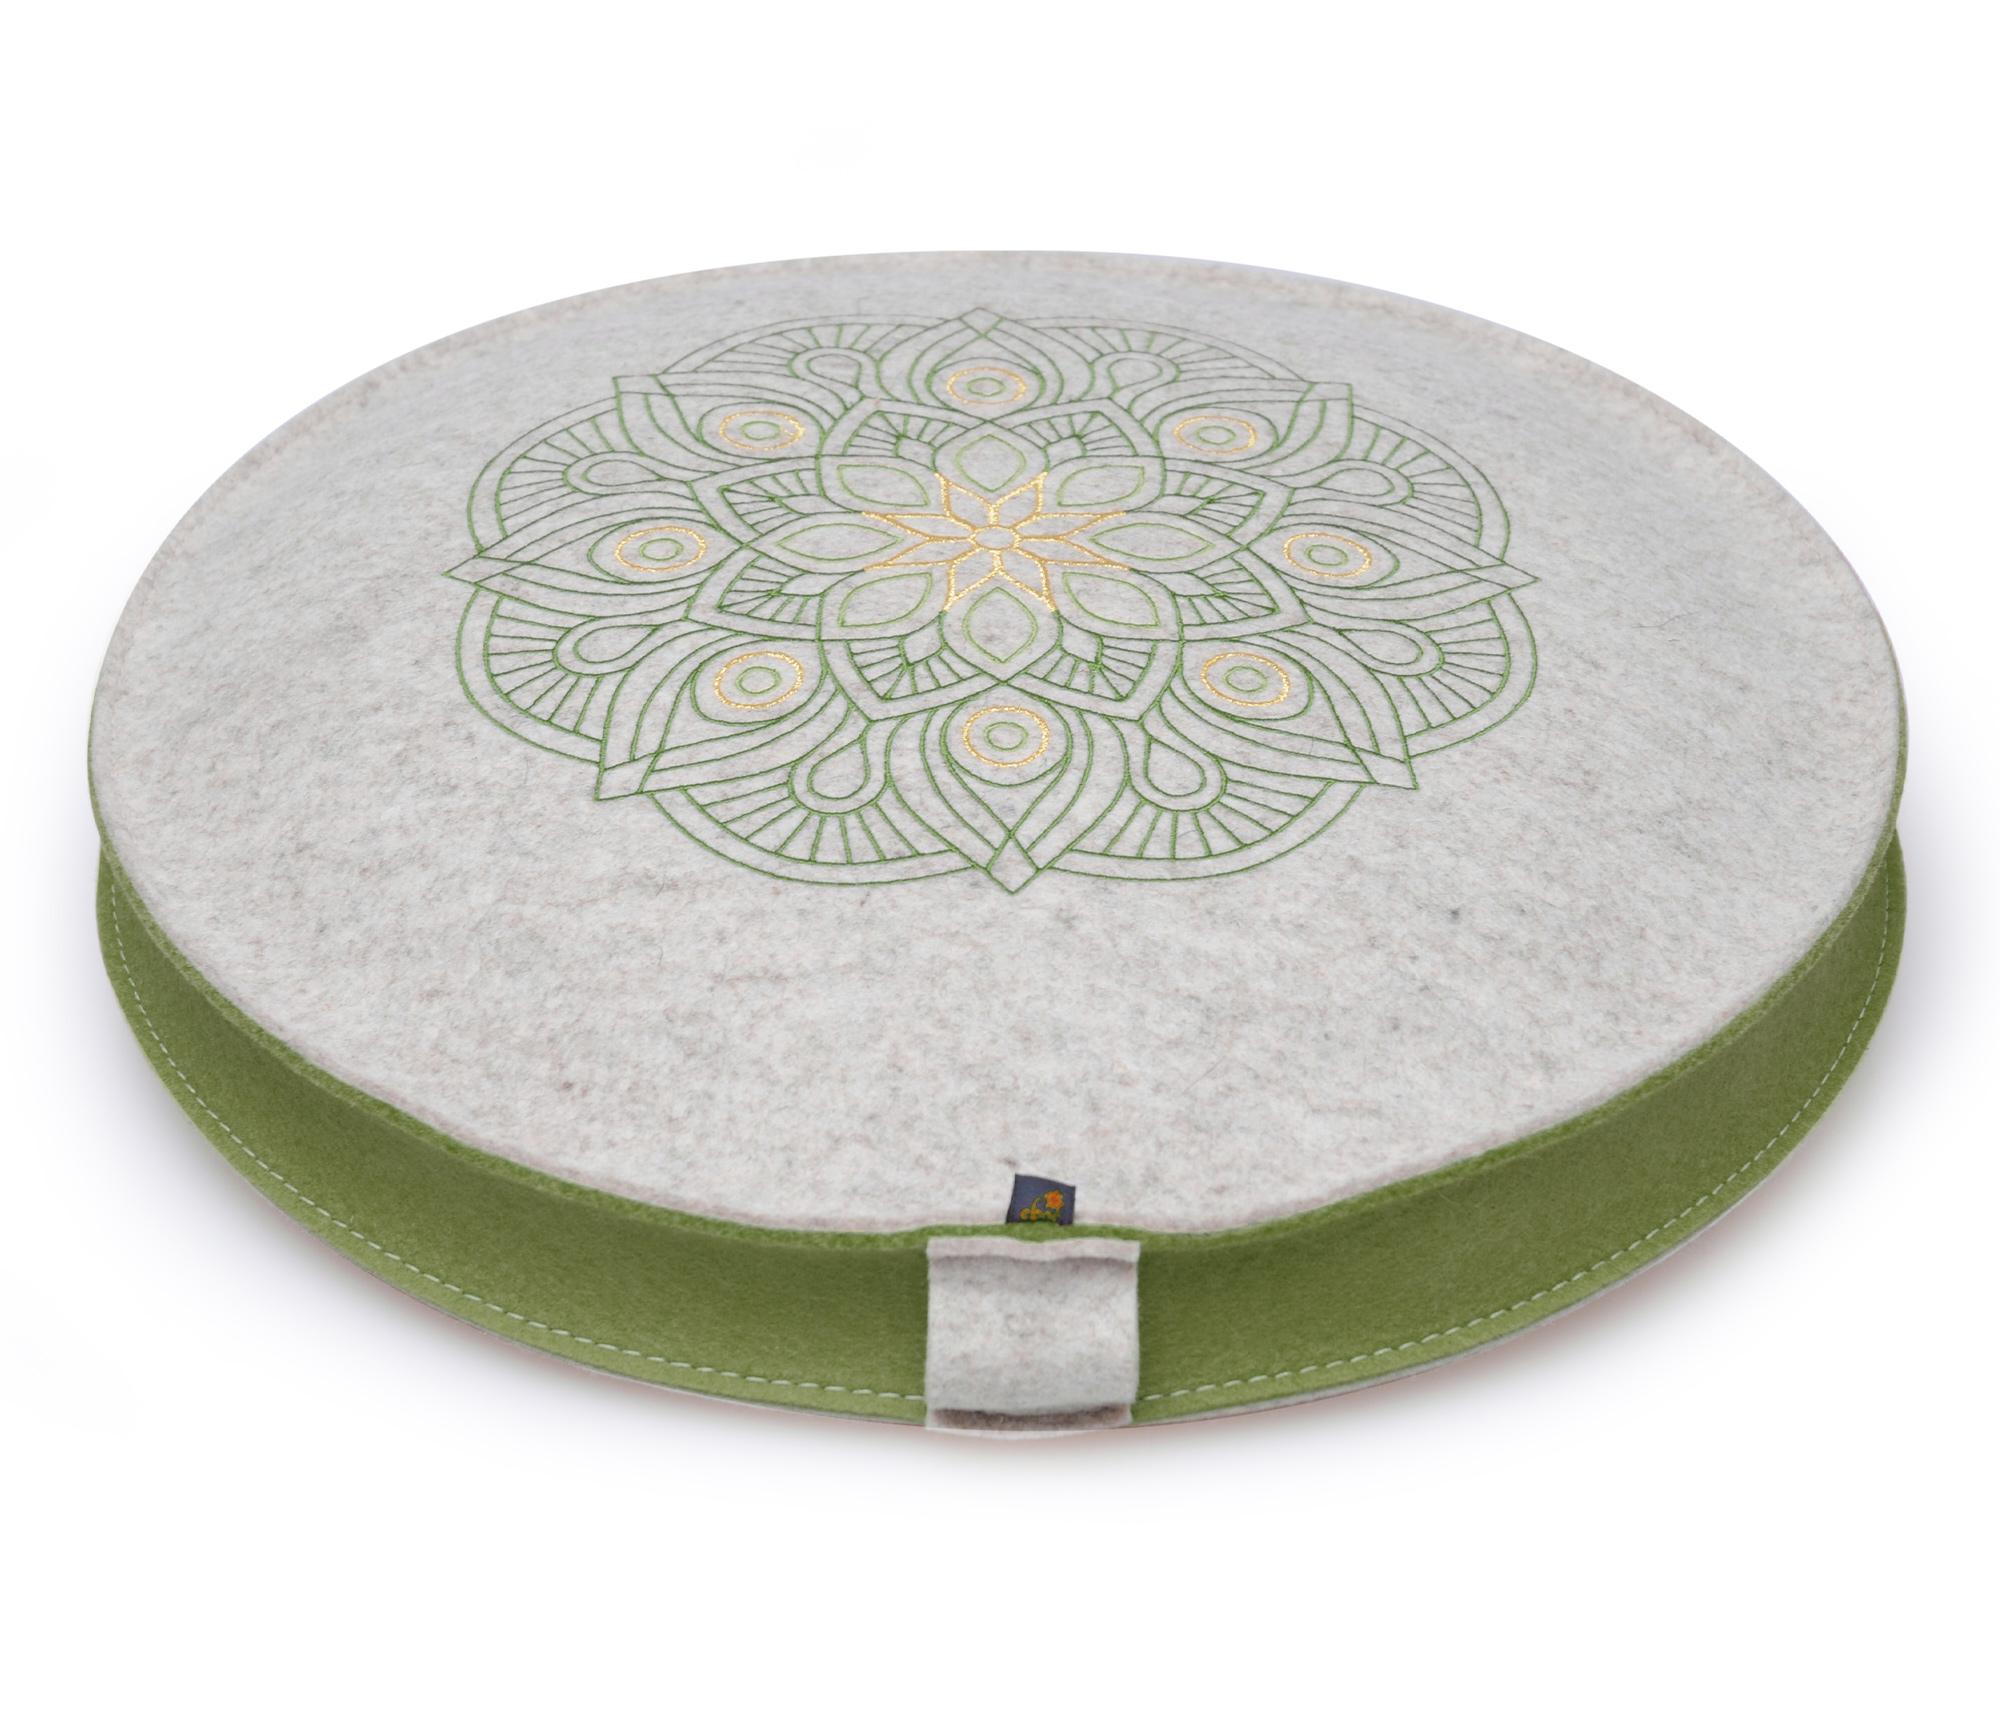 Yoga- und Meditationskissen Filz - Blume des Lebens - niedrig - 5 cm